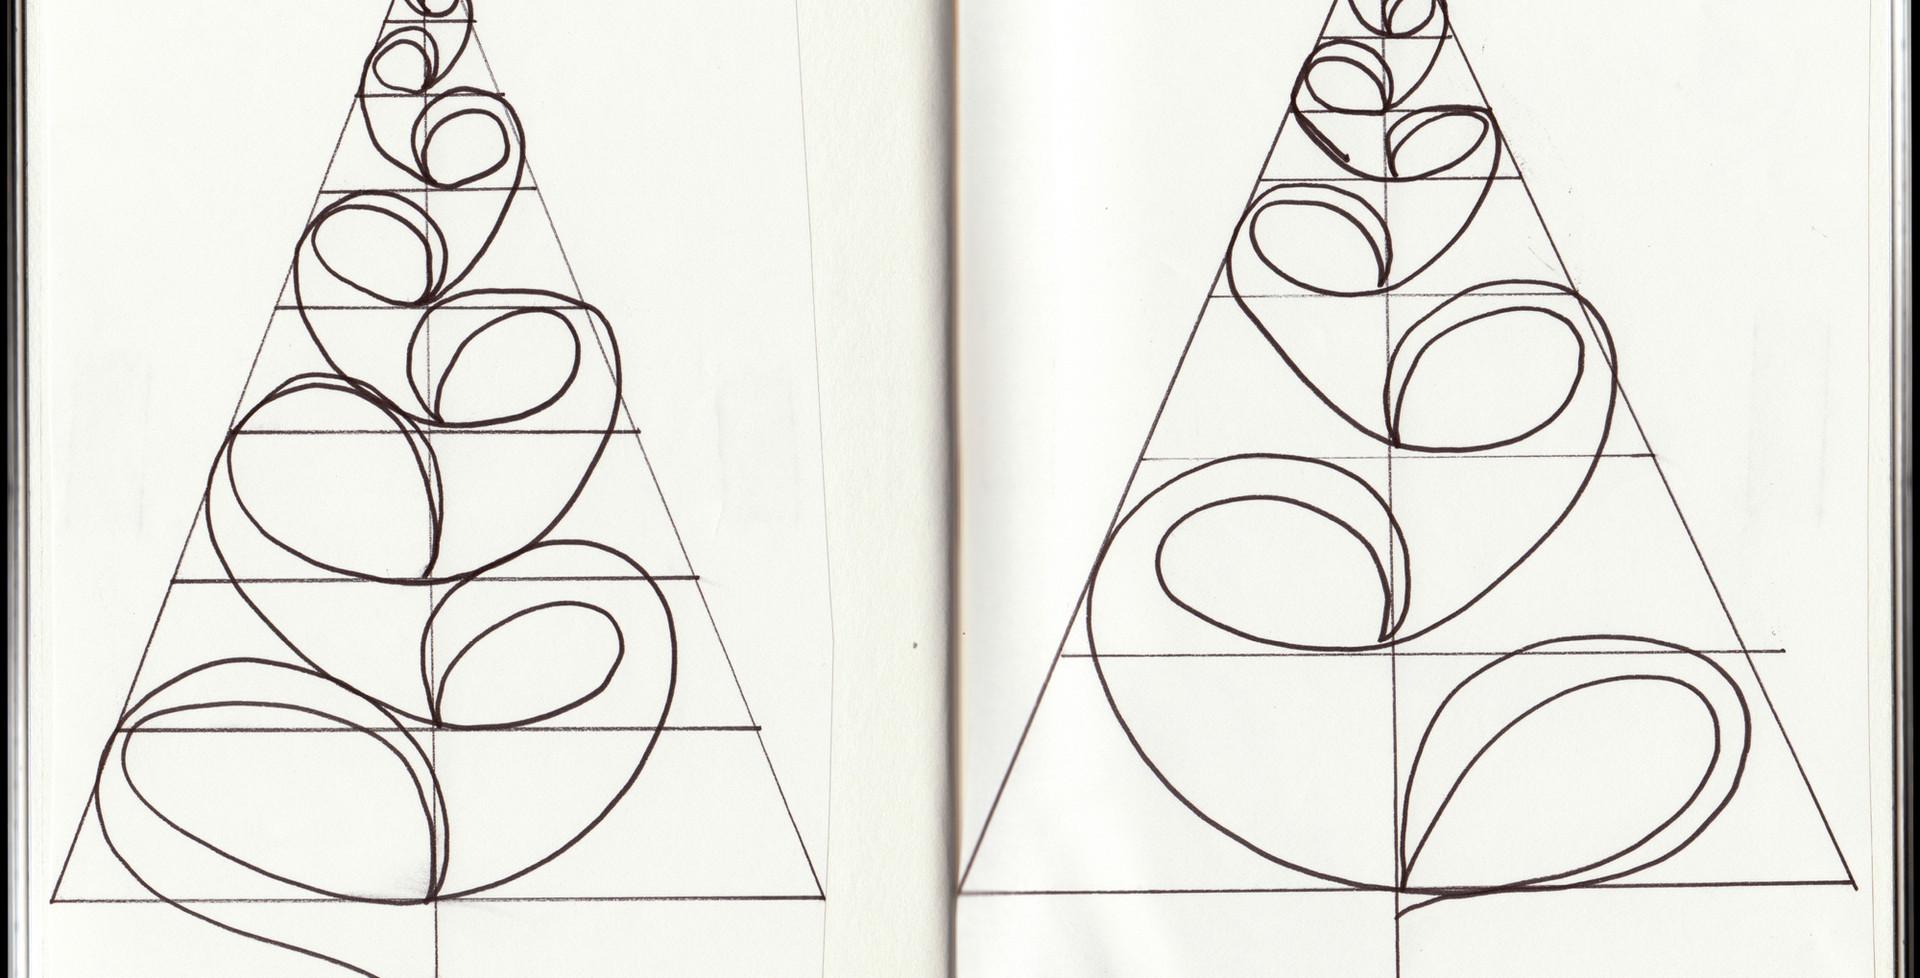 Sketchbook Page 2